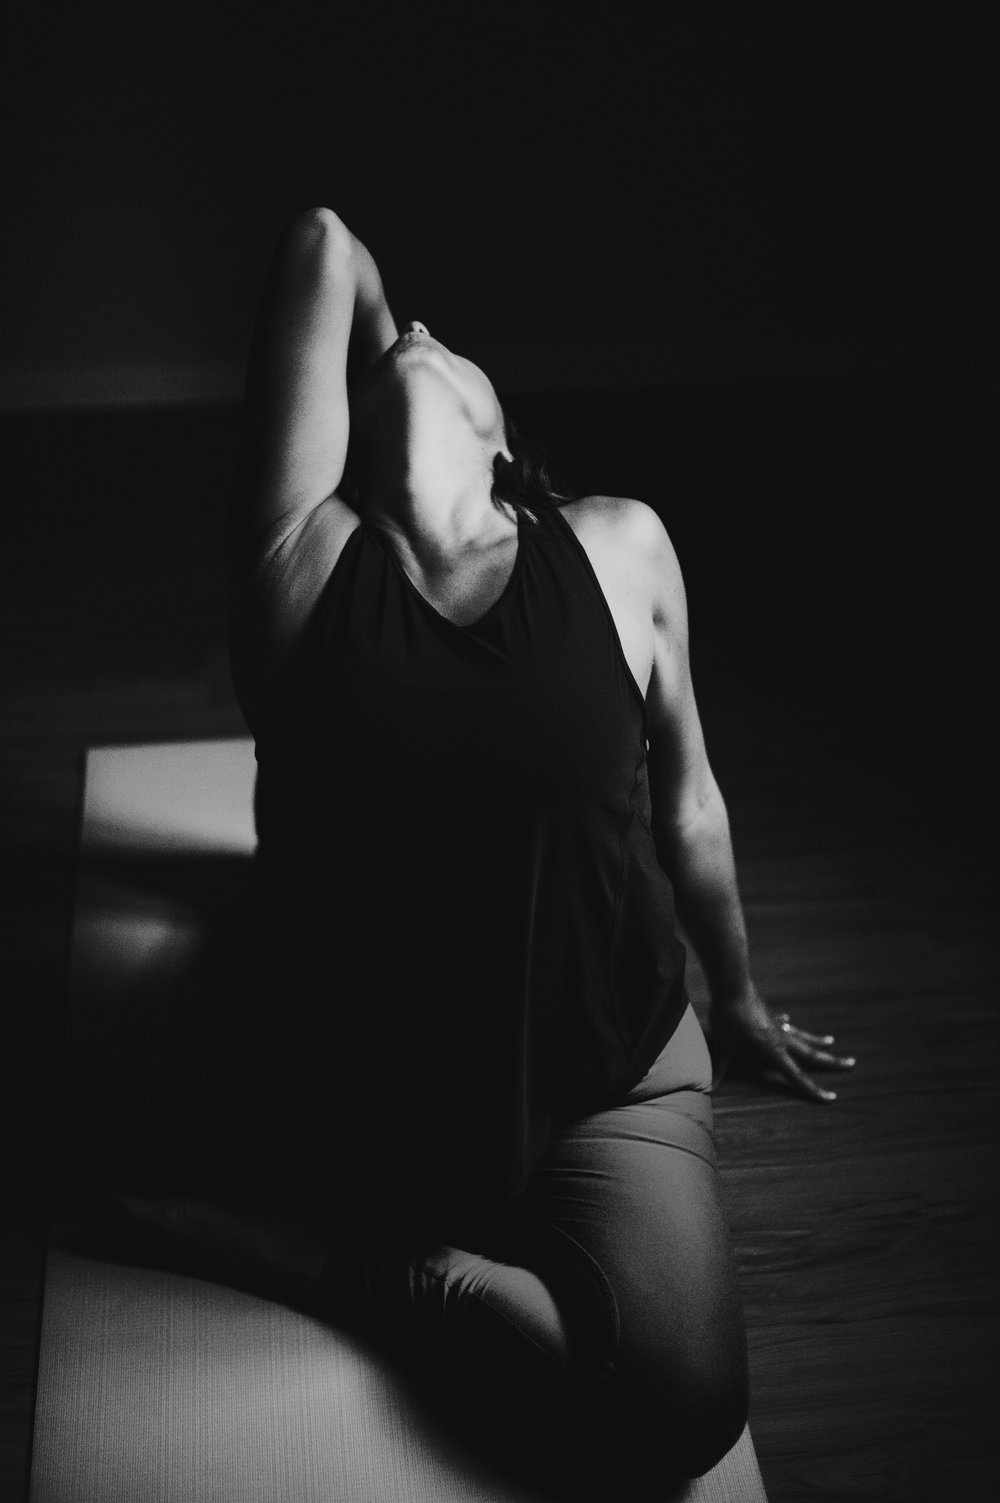 yoga-picture-the-vinyasa-people-katy-scherer-4.jpg